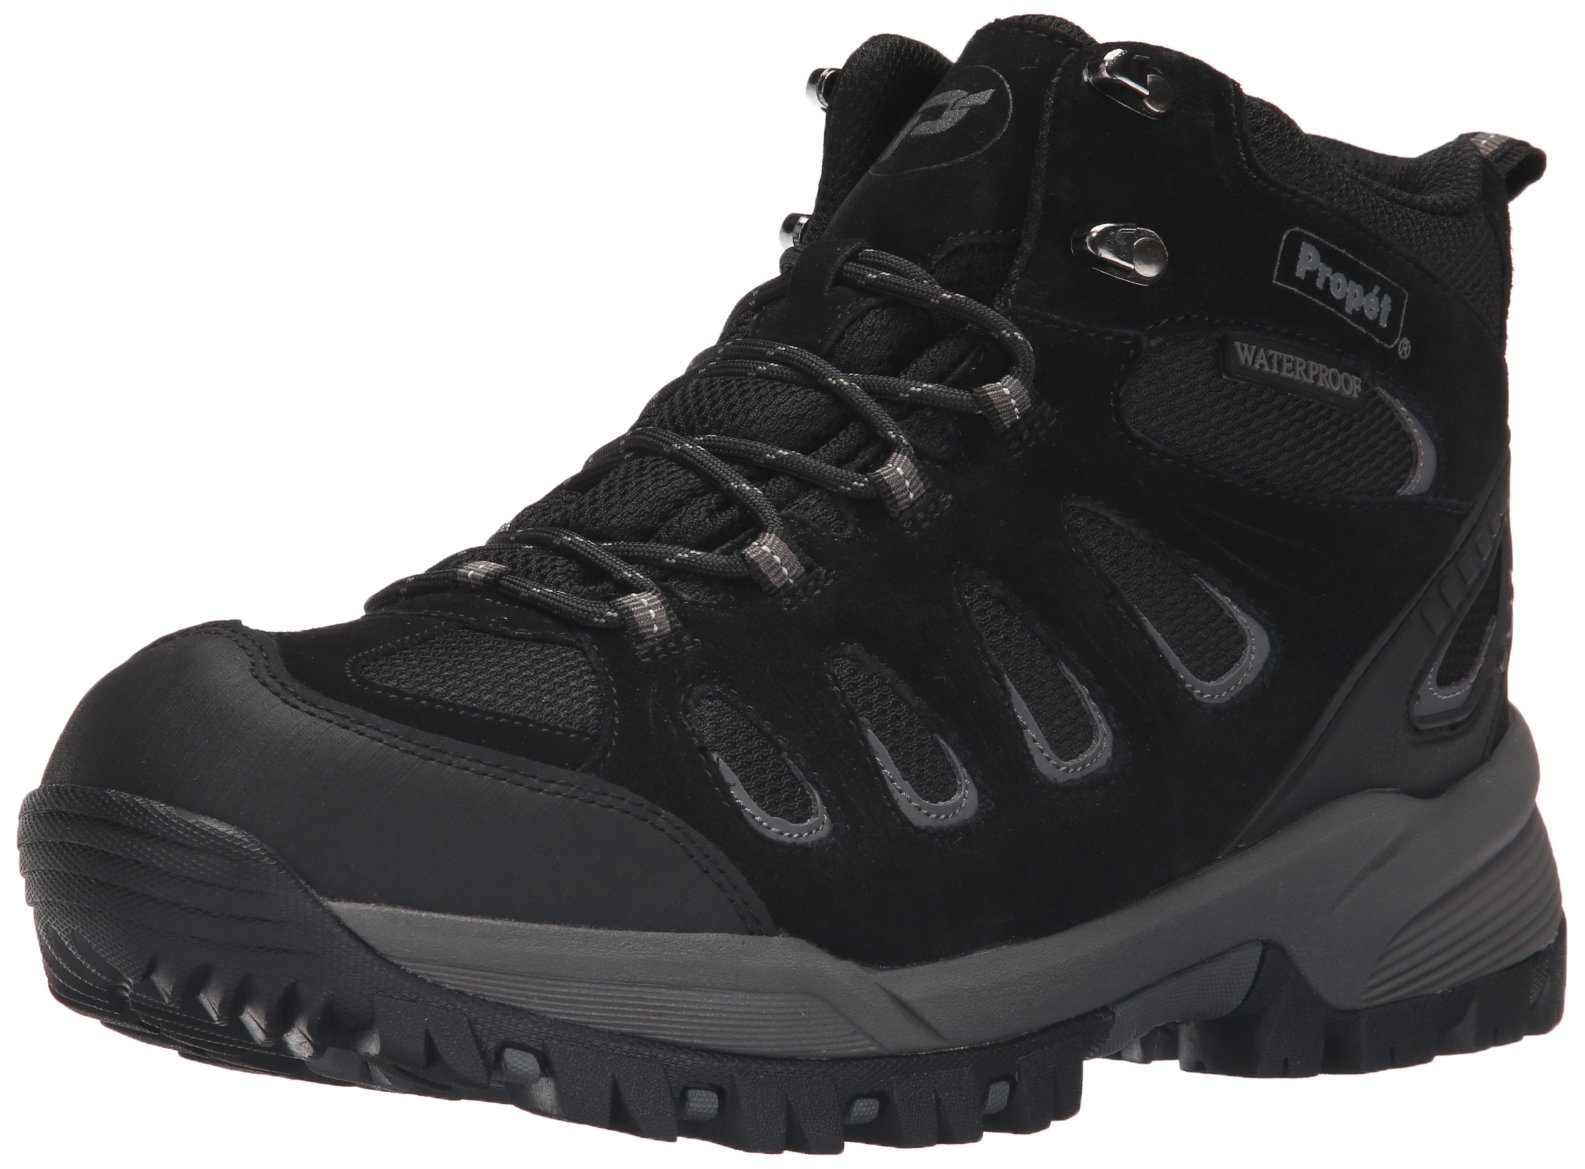 Propet Men's Ridge Walker Winter Boot, Black, 9.5 3E US by Propét